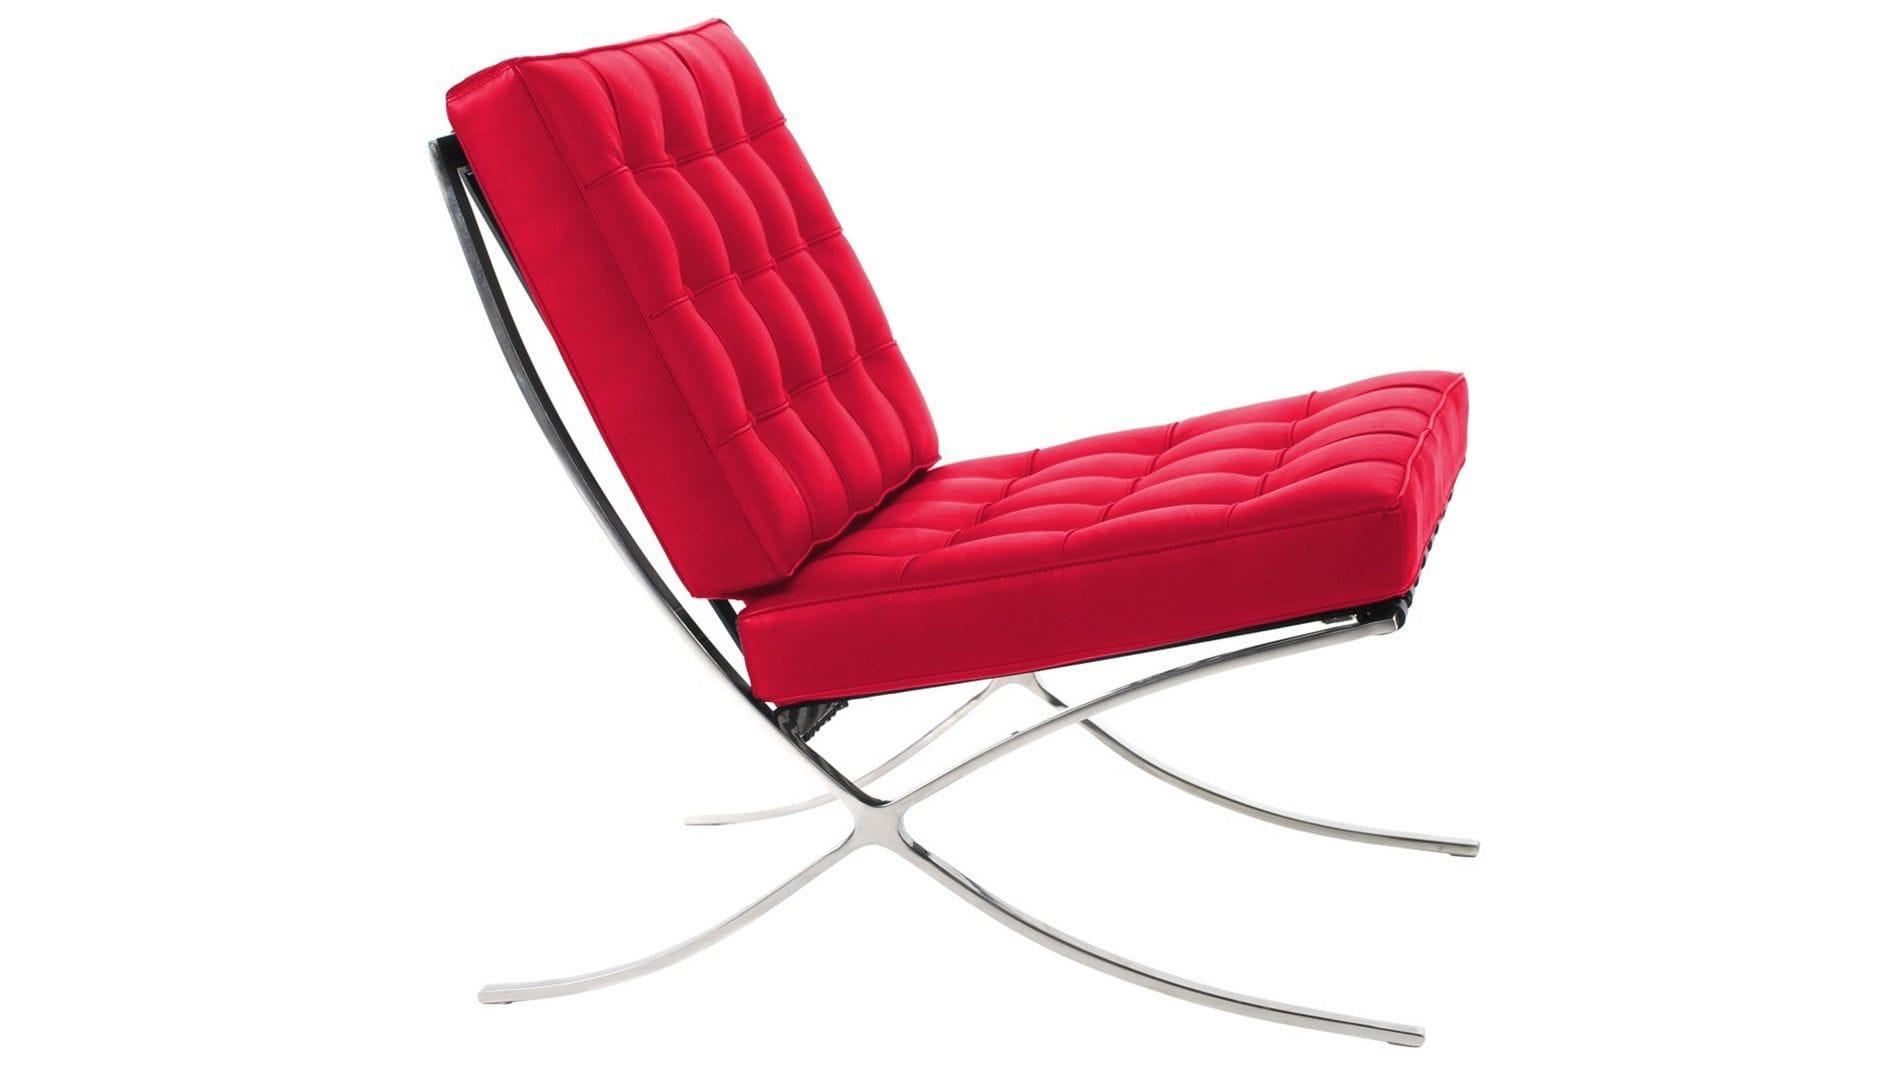 Кресло Barcelona Chair Красная Кожа Класса Премиум Р